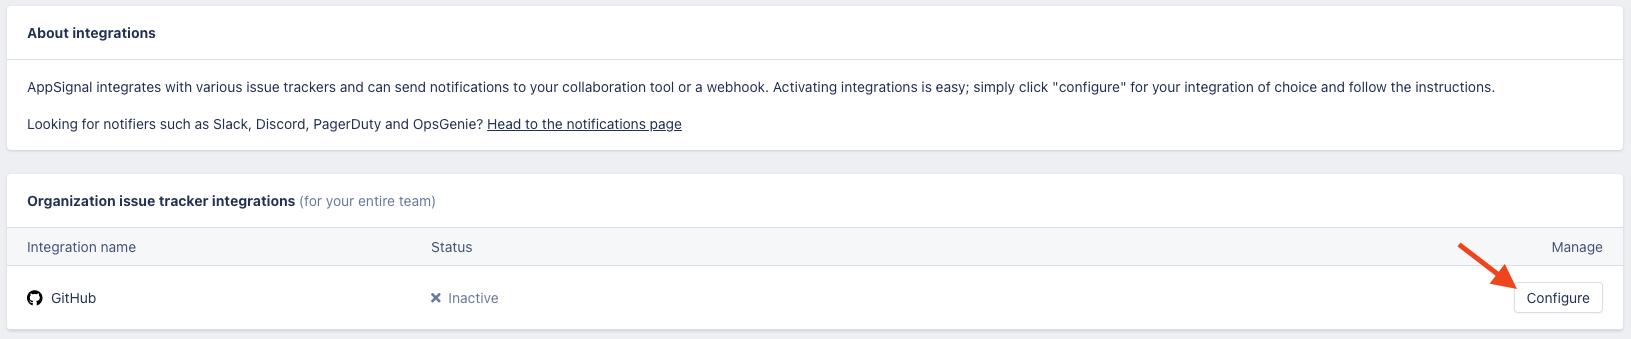 GitHub AppSignal integration